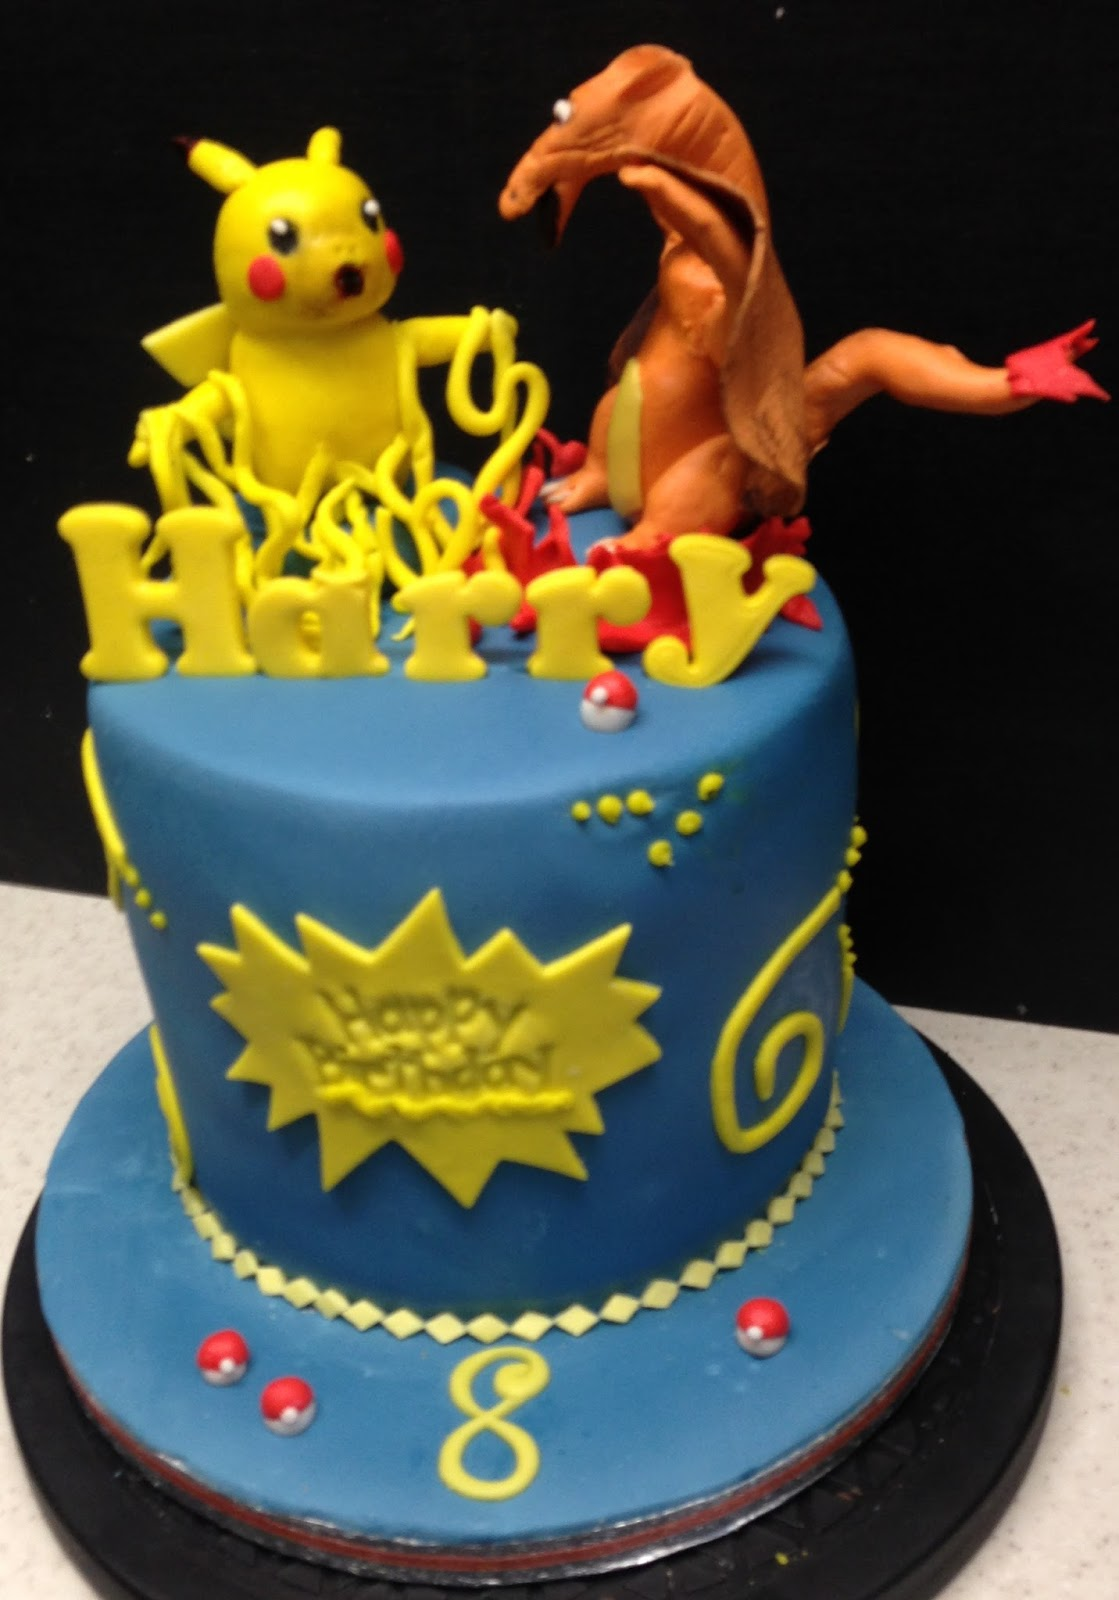 Poppyfield Card Crafts Happy Birthday Harry Card And Cake